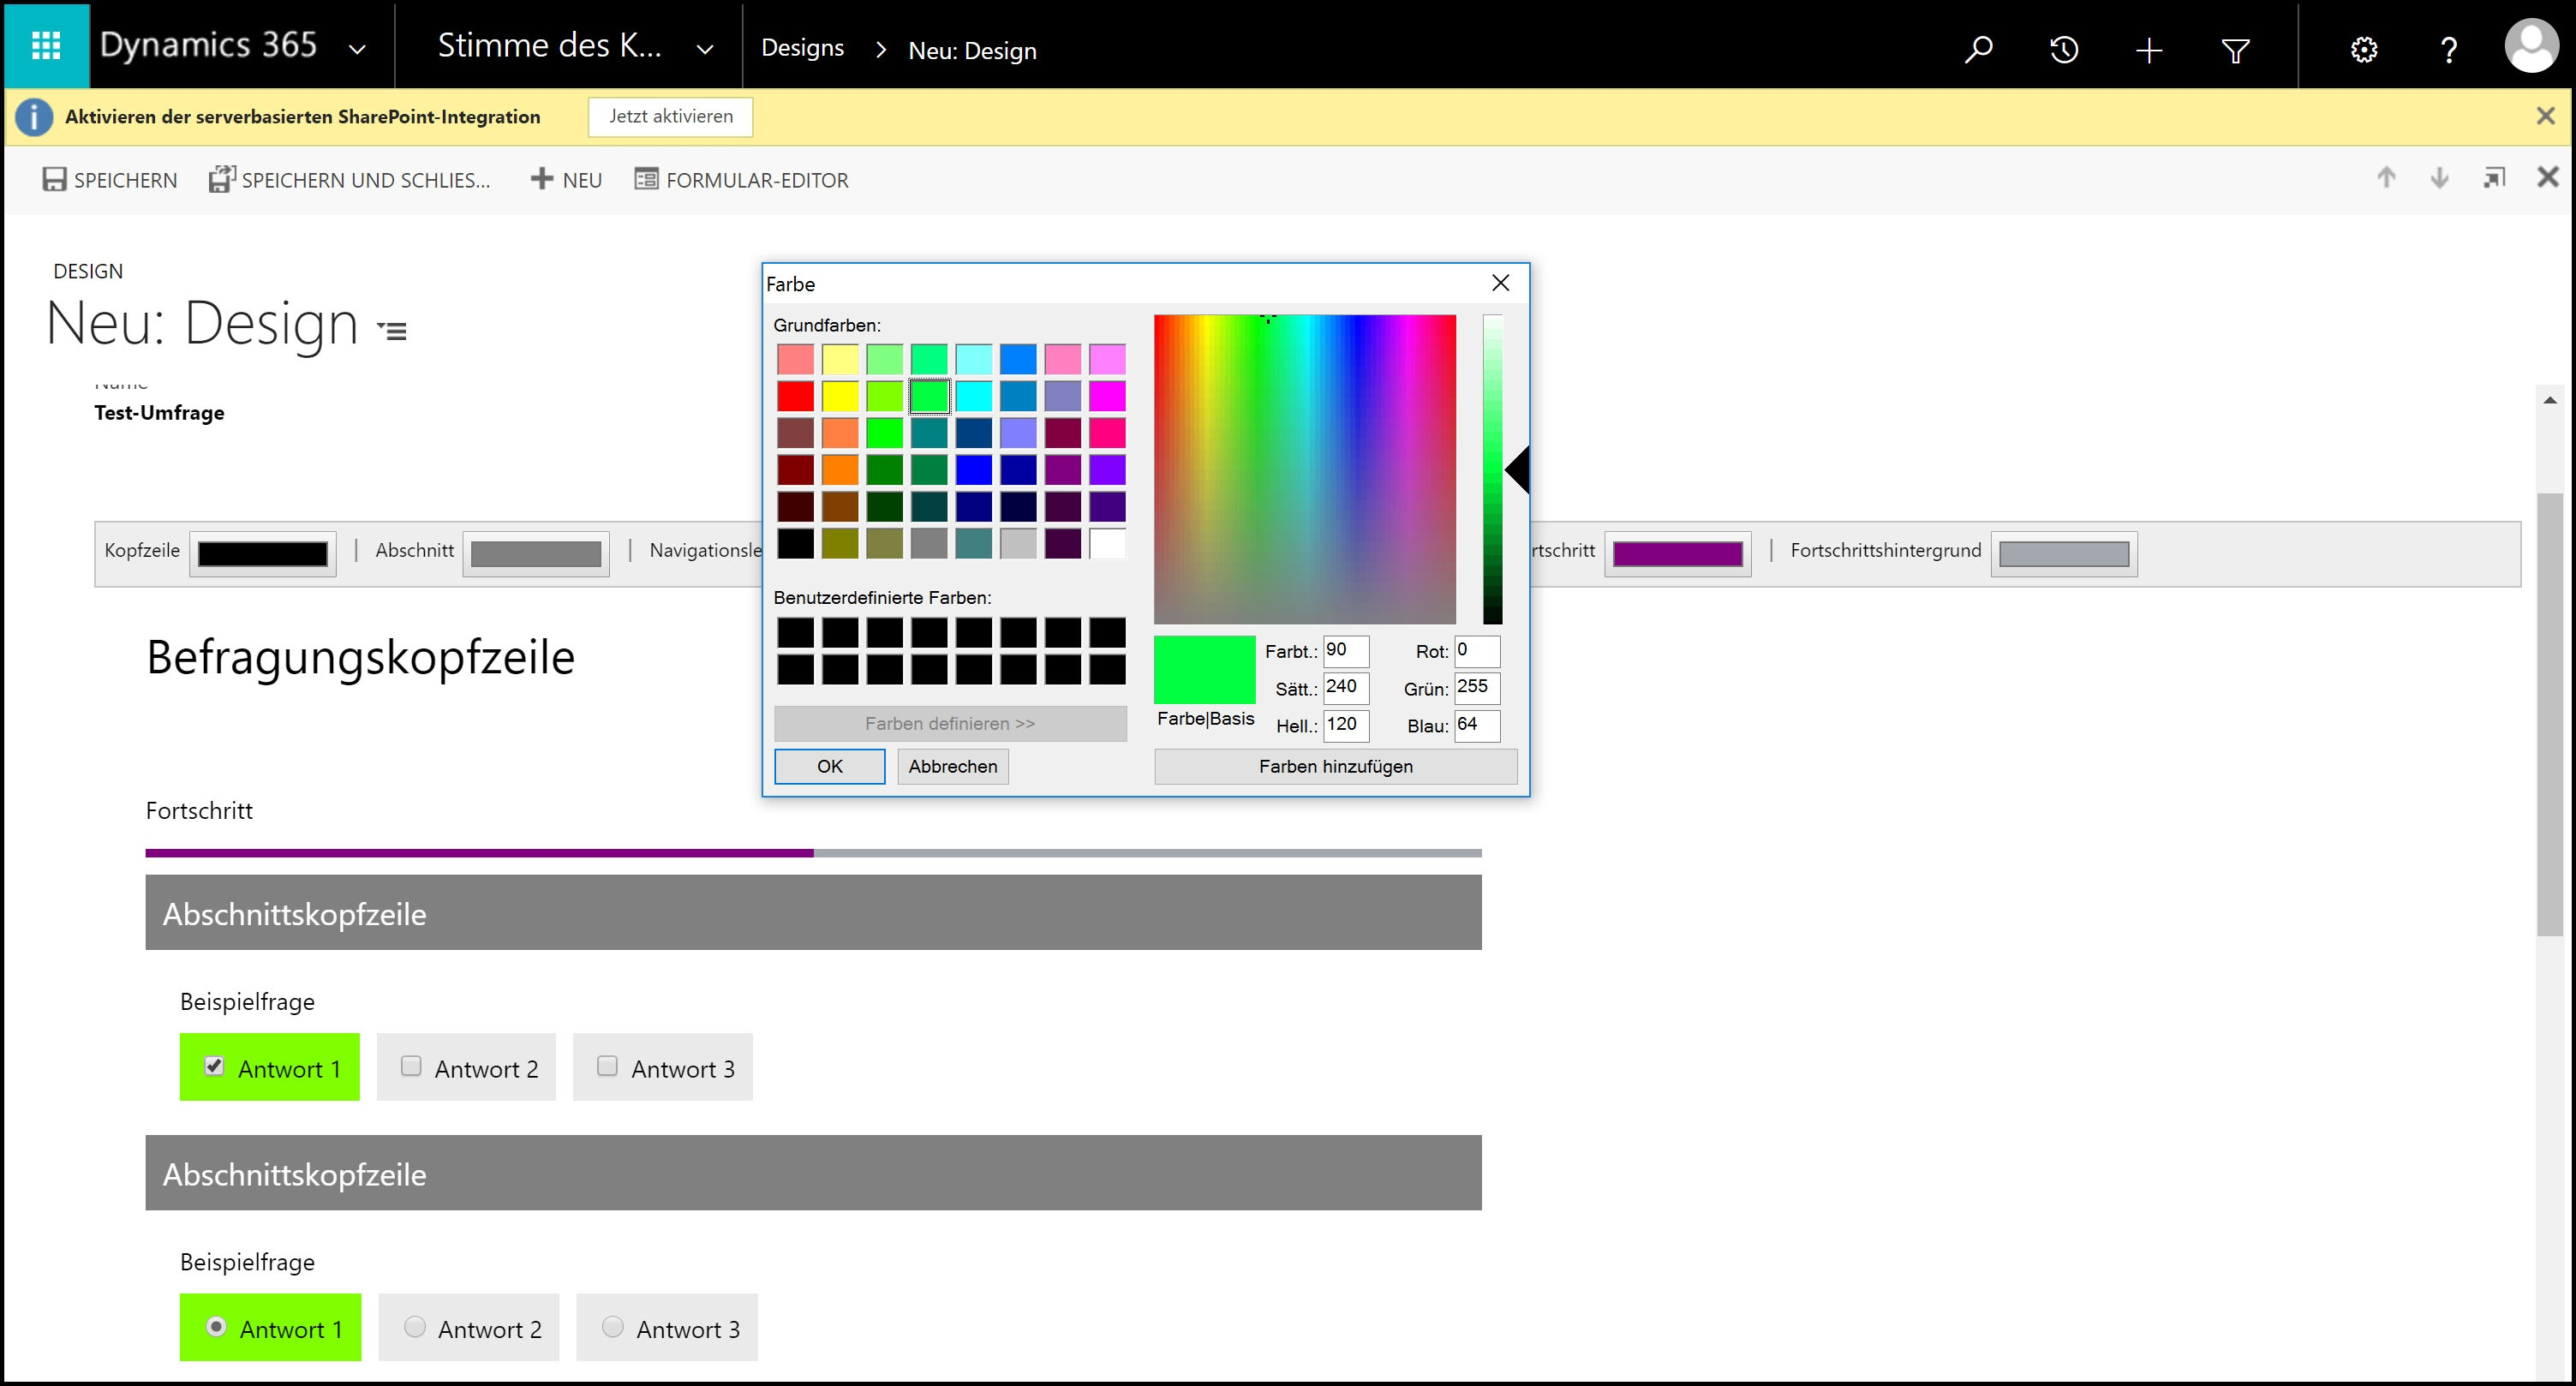 Microsoft Dynamics 365 DesignDatensatz